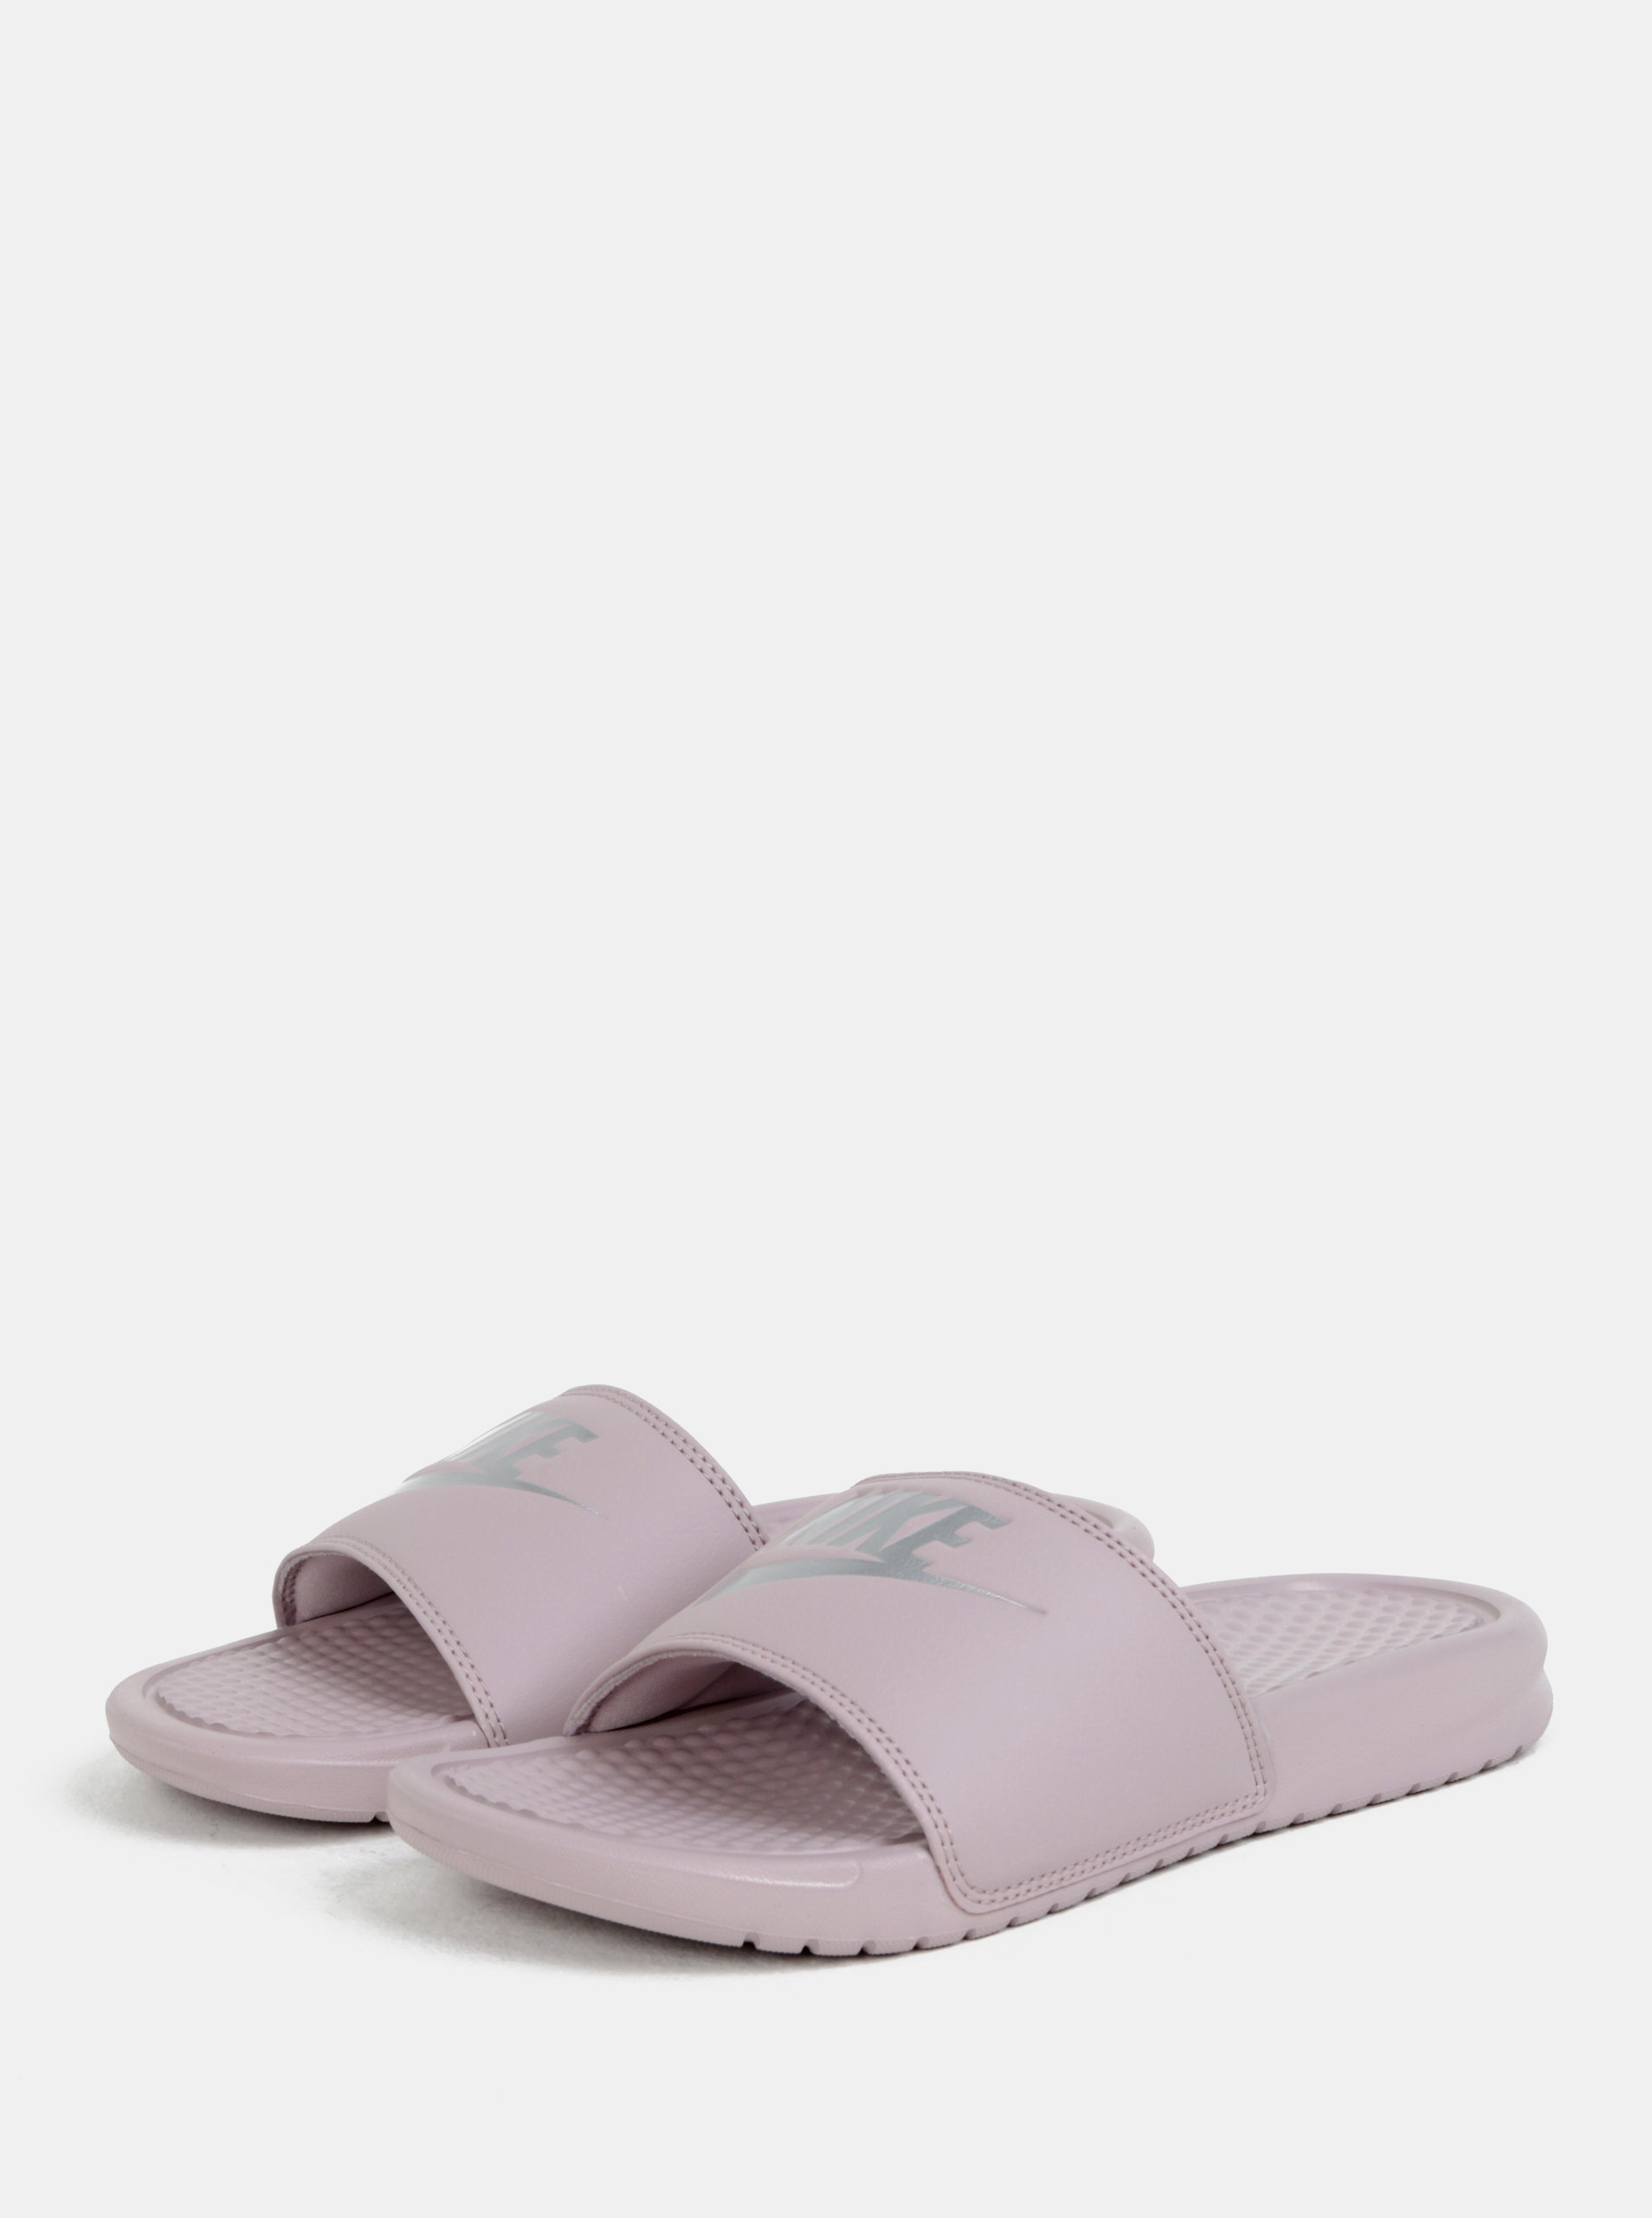 2bb6ead4a399c Svetlofialové dámske šľapky Nike Benassi | ZOOT.sk